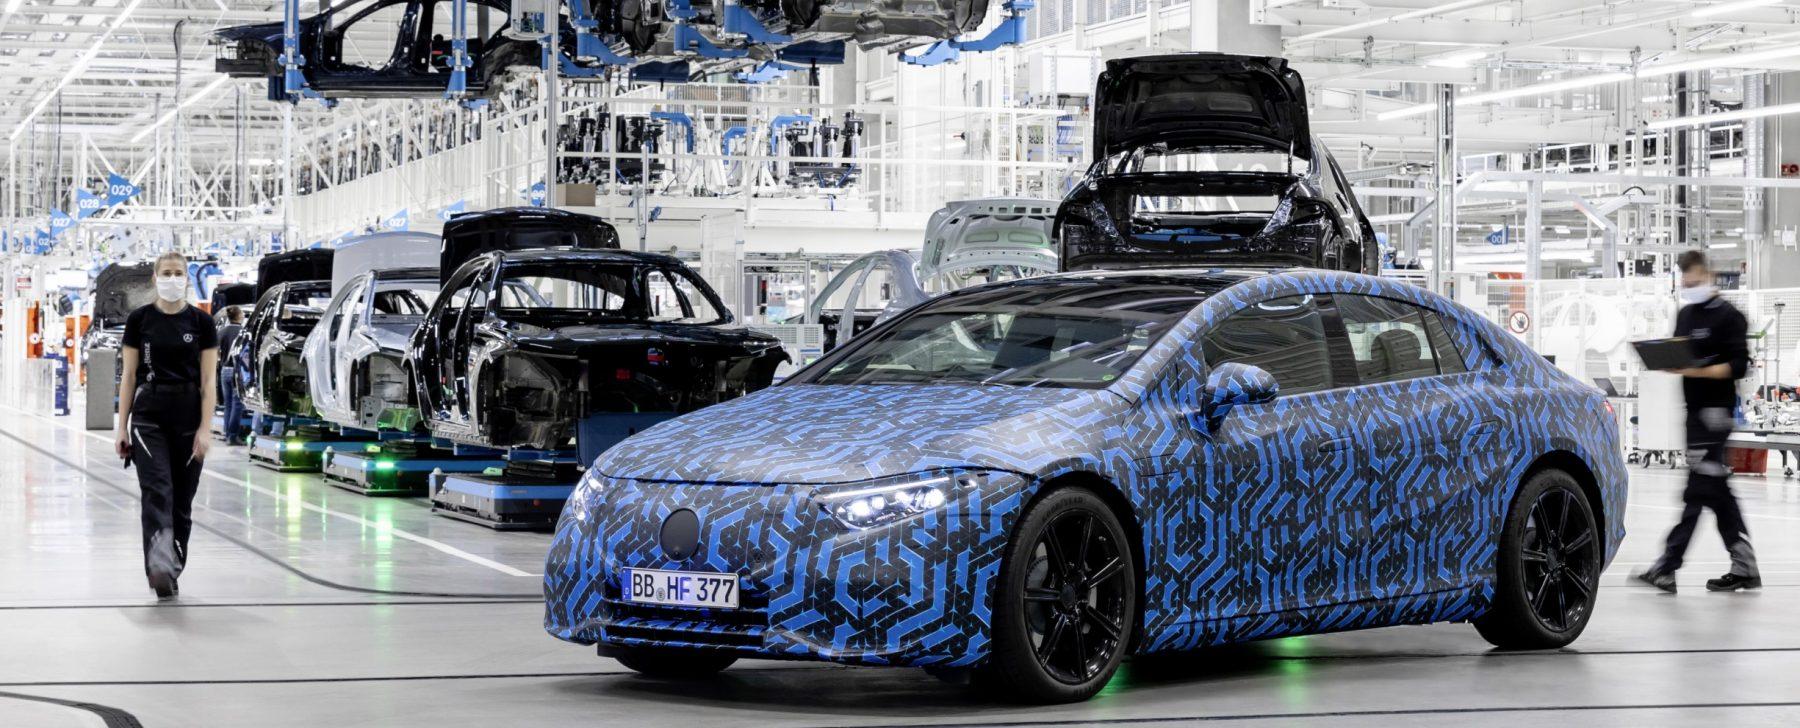 Mercedes lanzará seis nuevos coches eléctricos en un año